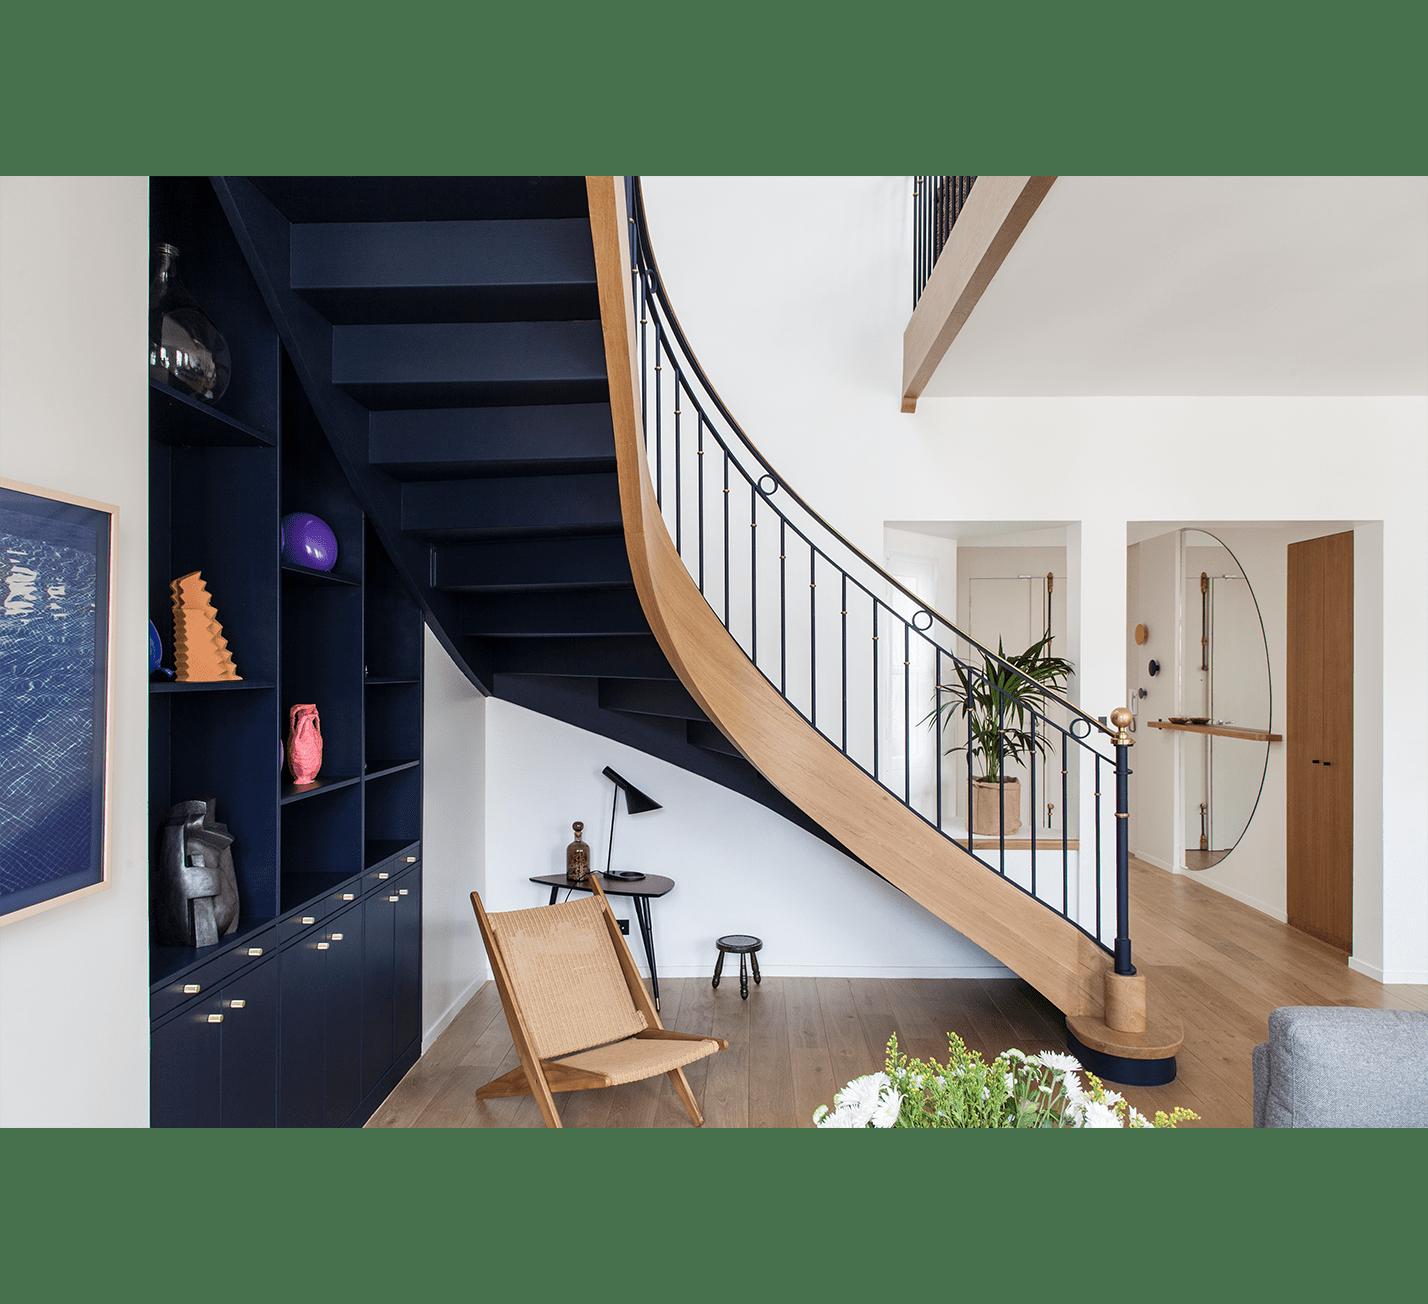 Projet-Arlequin-Atelier-Steve-Pauline-Borgia-Architecture-interieur-18-min